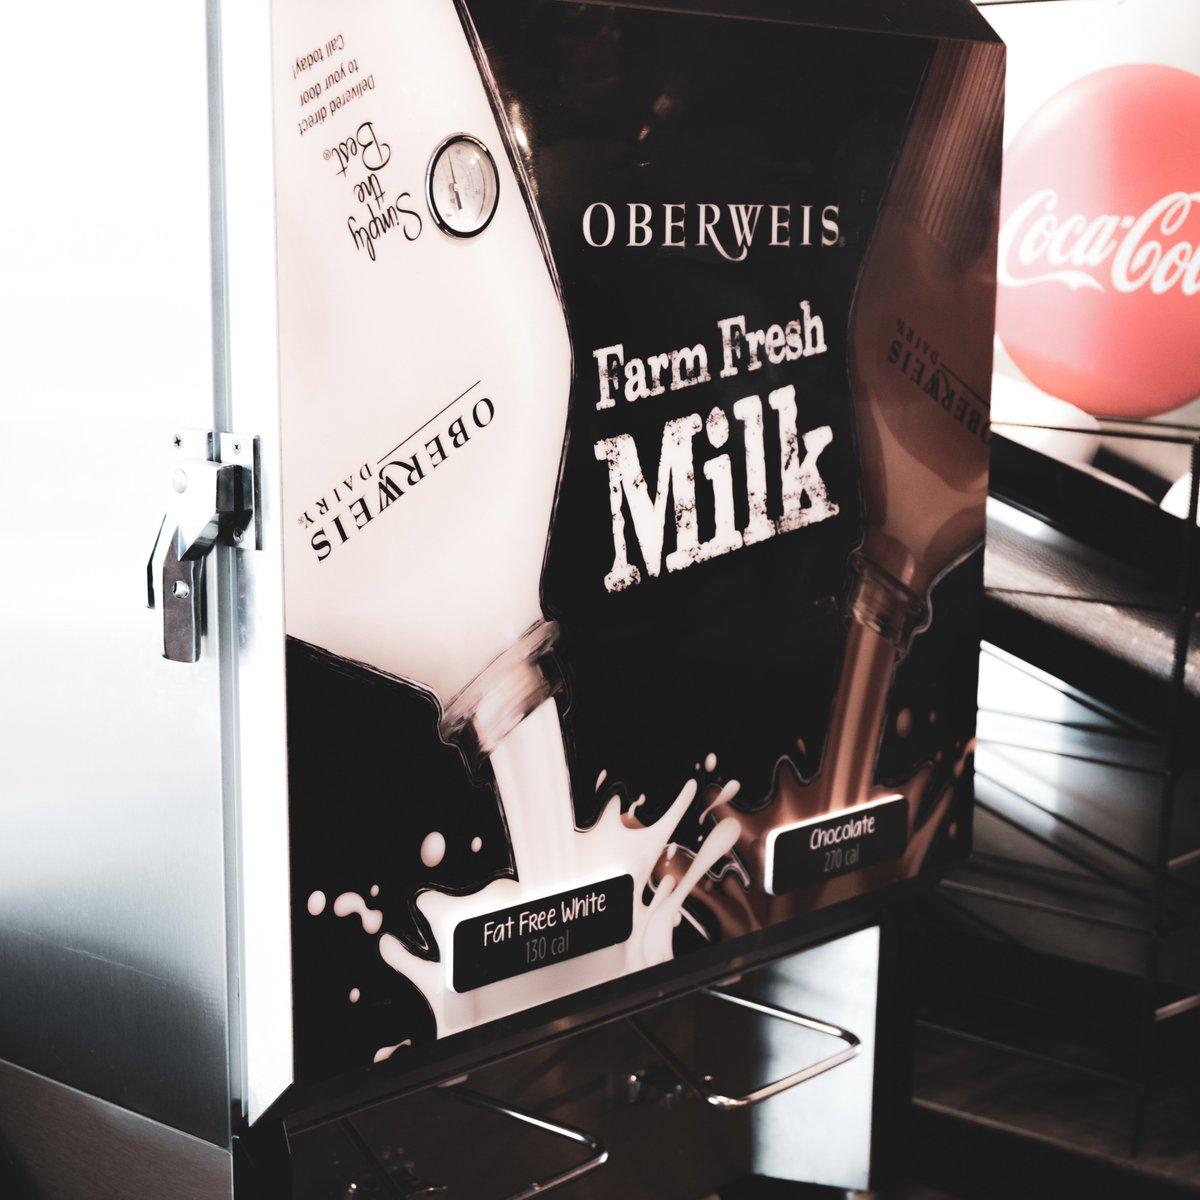 Bottomless Oberweis chocolate milk at TBJ. Every. Single. Day. #thatburgerjoint #oberweis #chocolatemilk